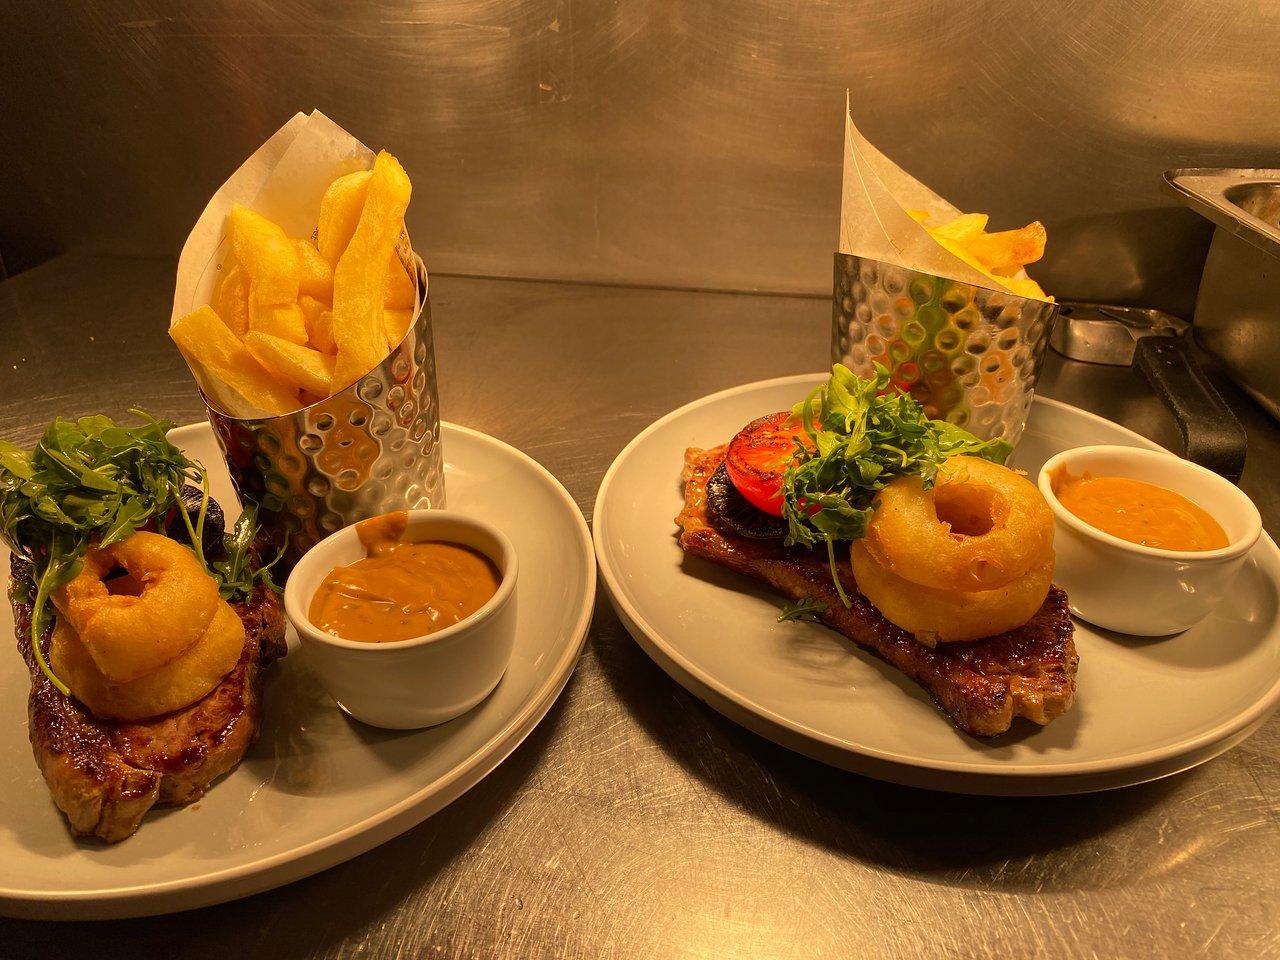 Bainbridge Seafood Restaurant Dinner Christmas Eve 2021 The 10 Best Restaurants In Banbridge Updated June 2021 Tripadvisor